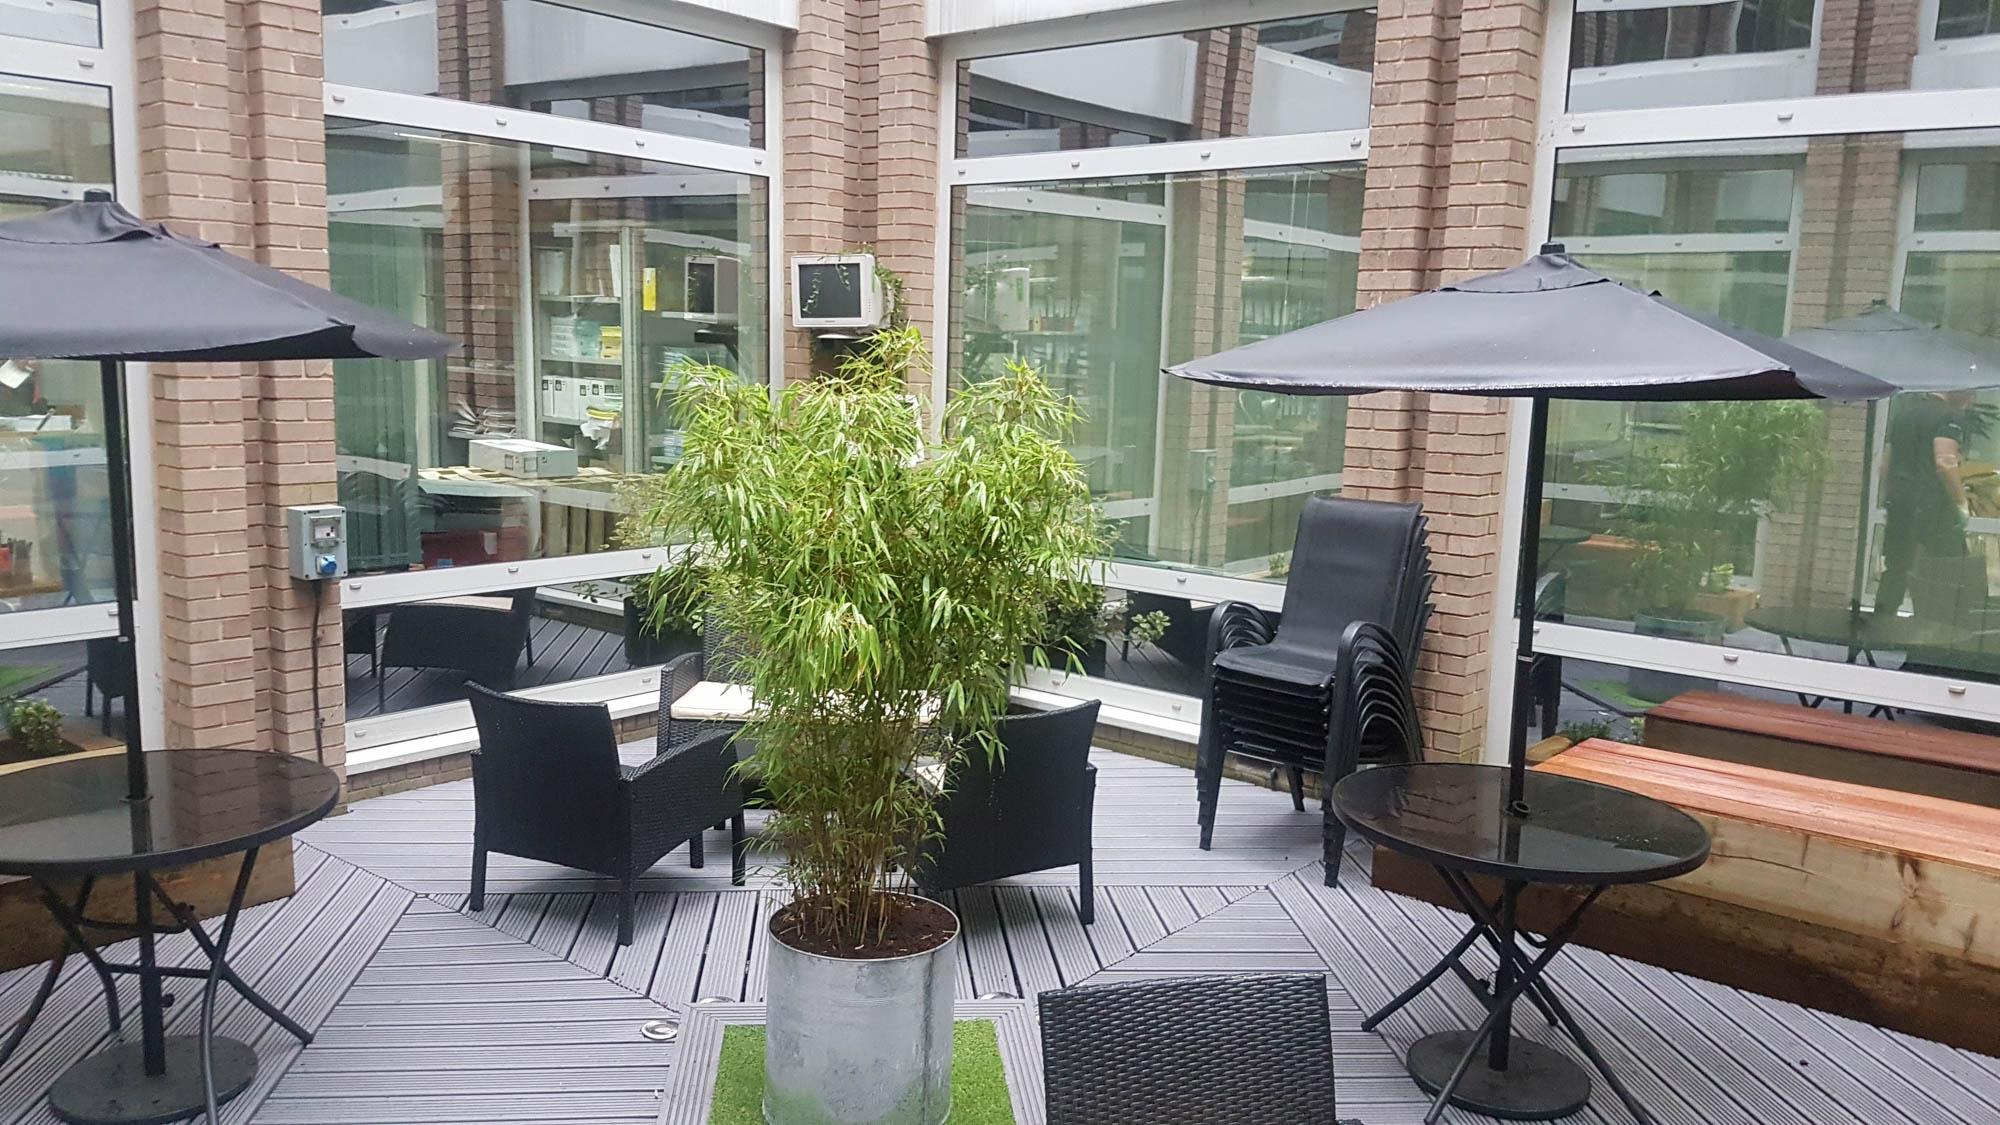 bristol-computer-society-exterior-plant-displays-plantcare-image-5